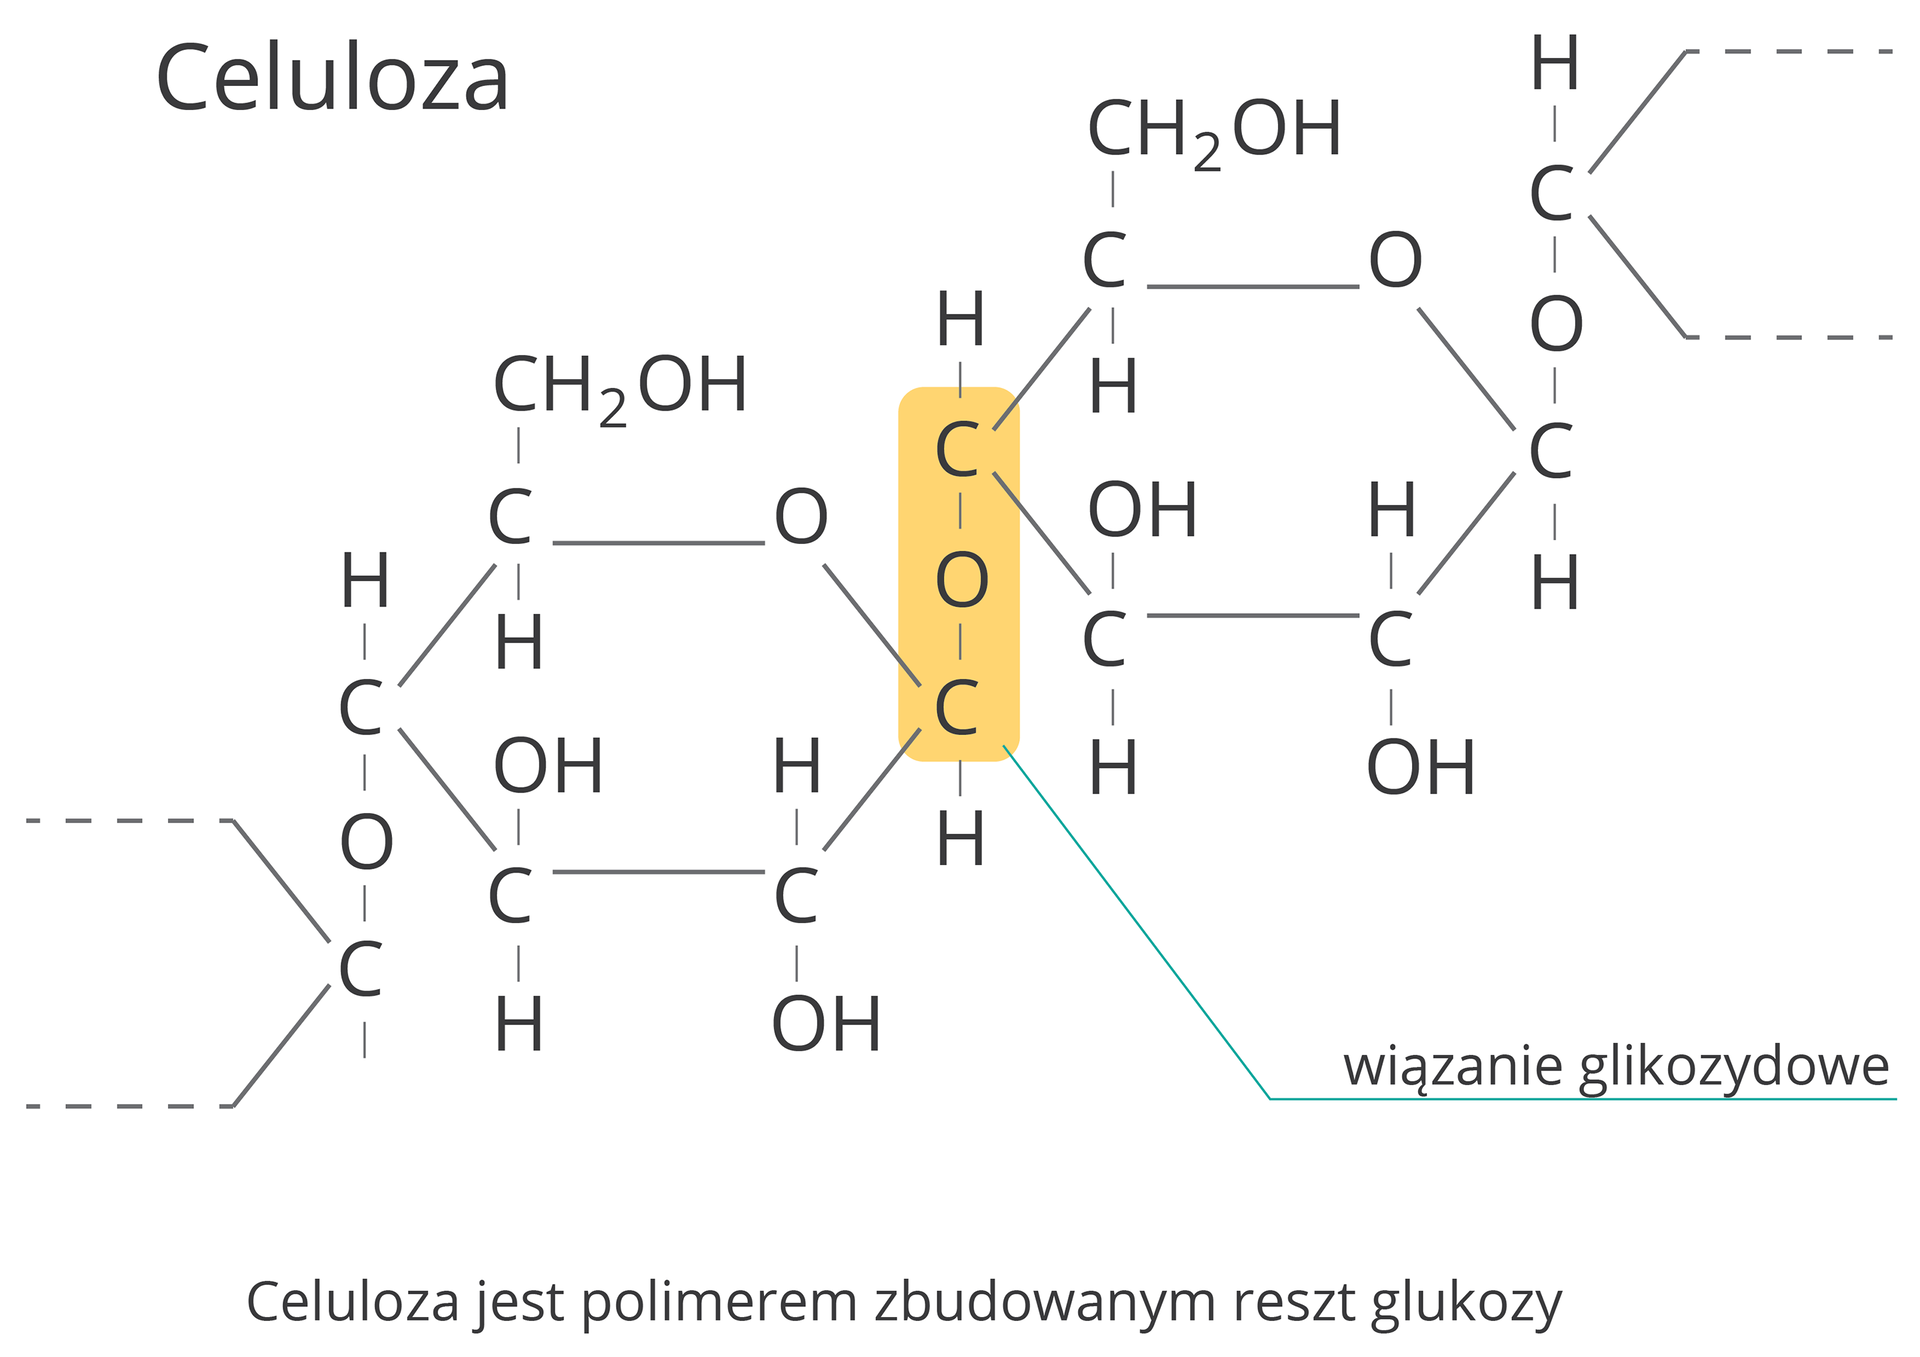 Celuloza jest polimerem zbudowanym reszt glukozy